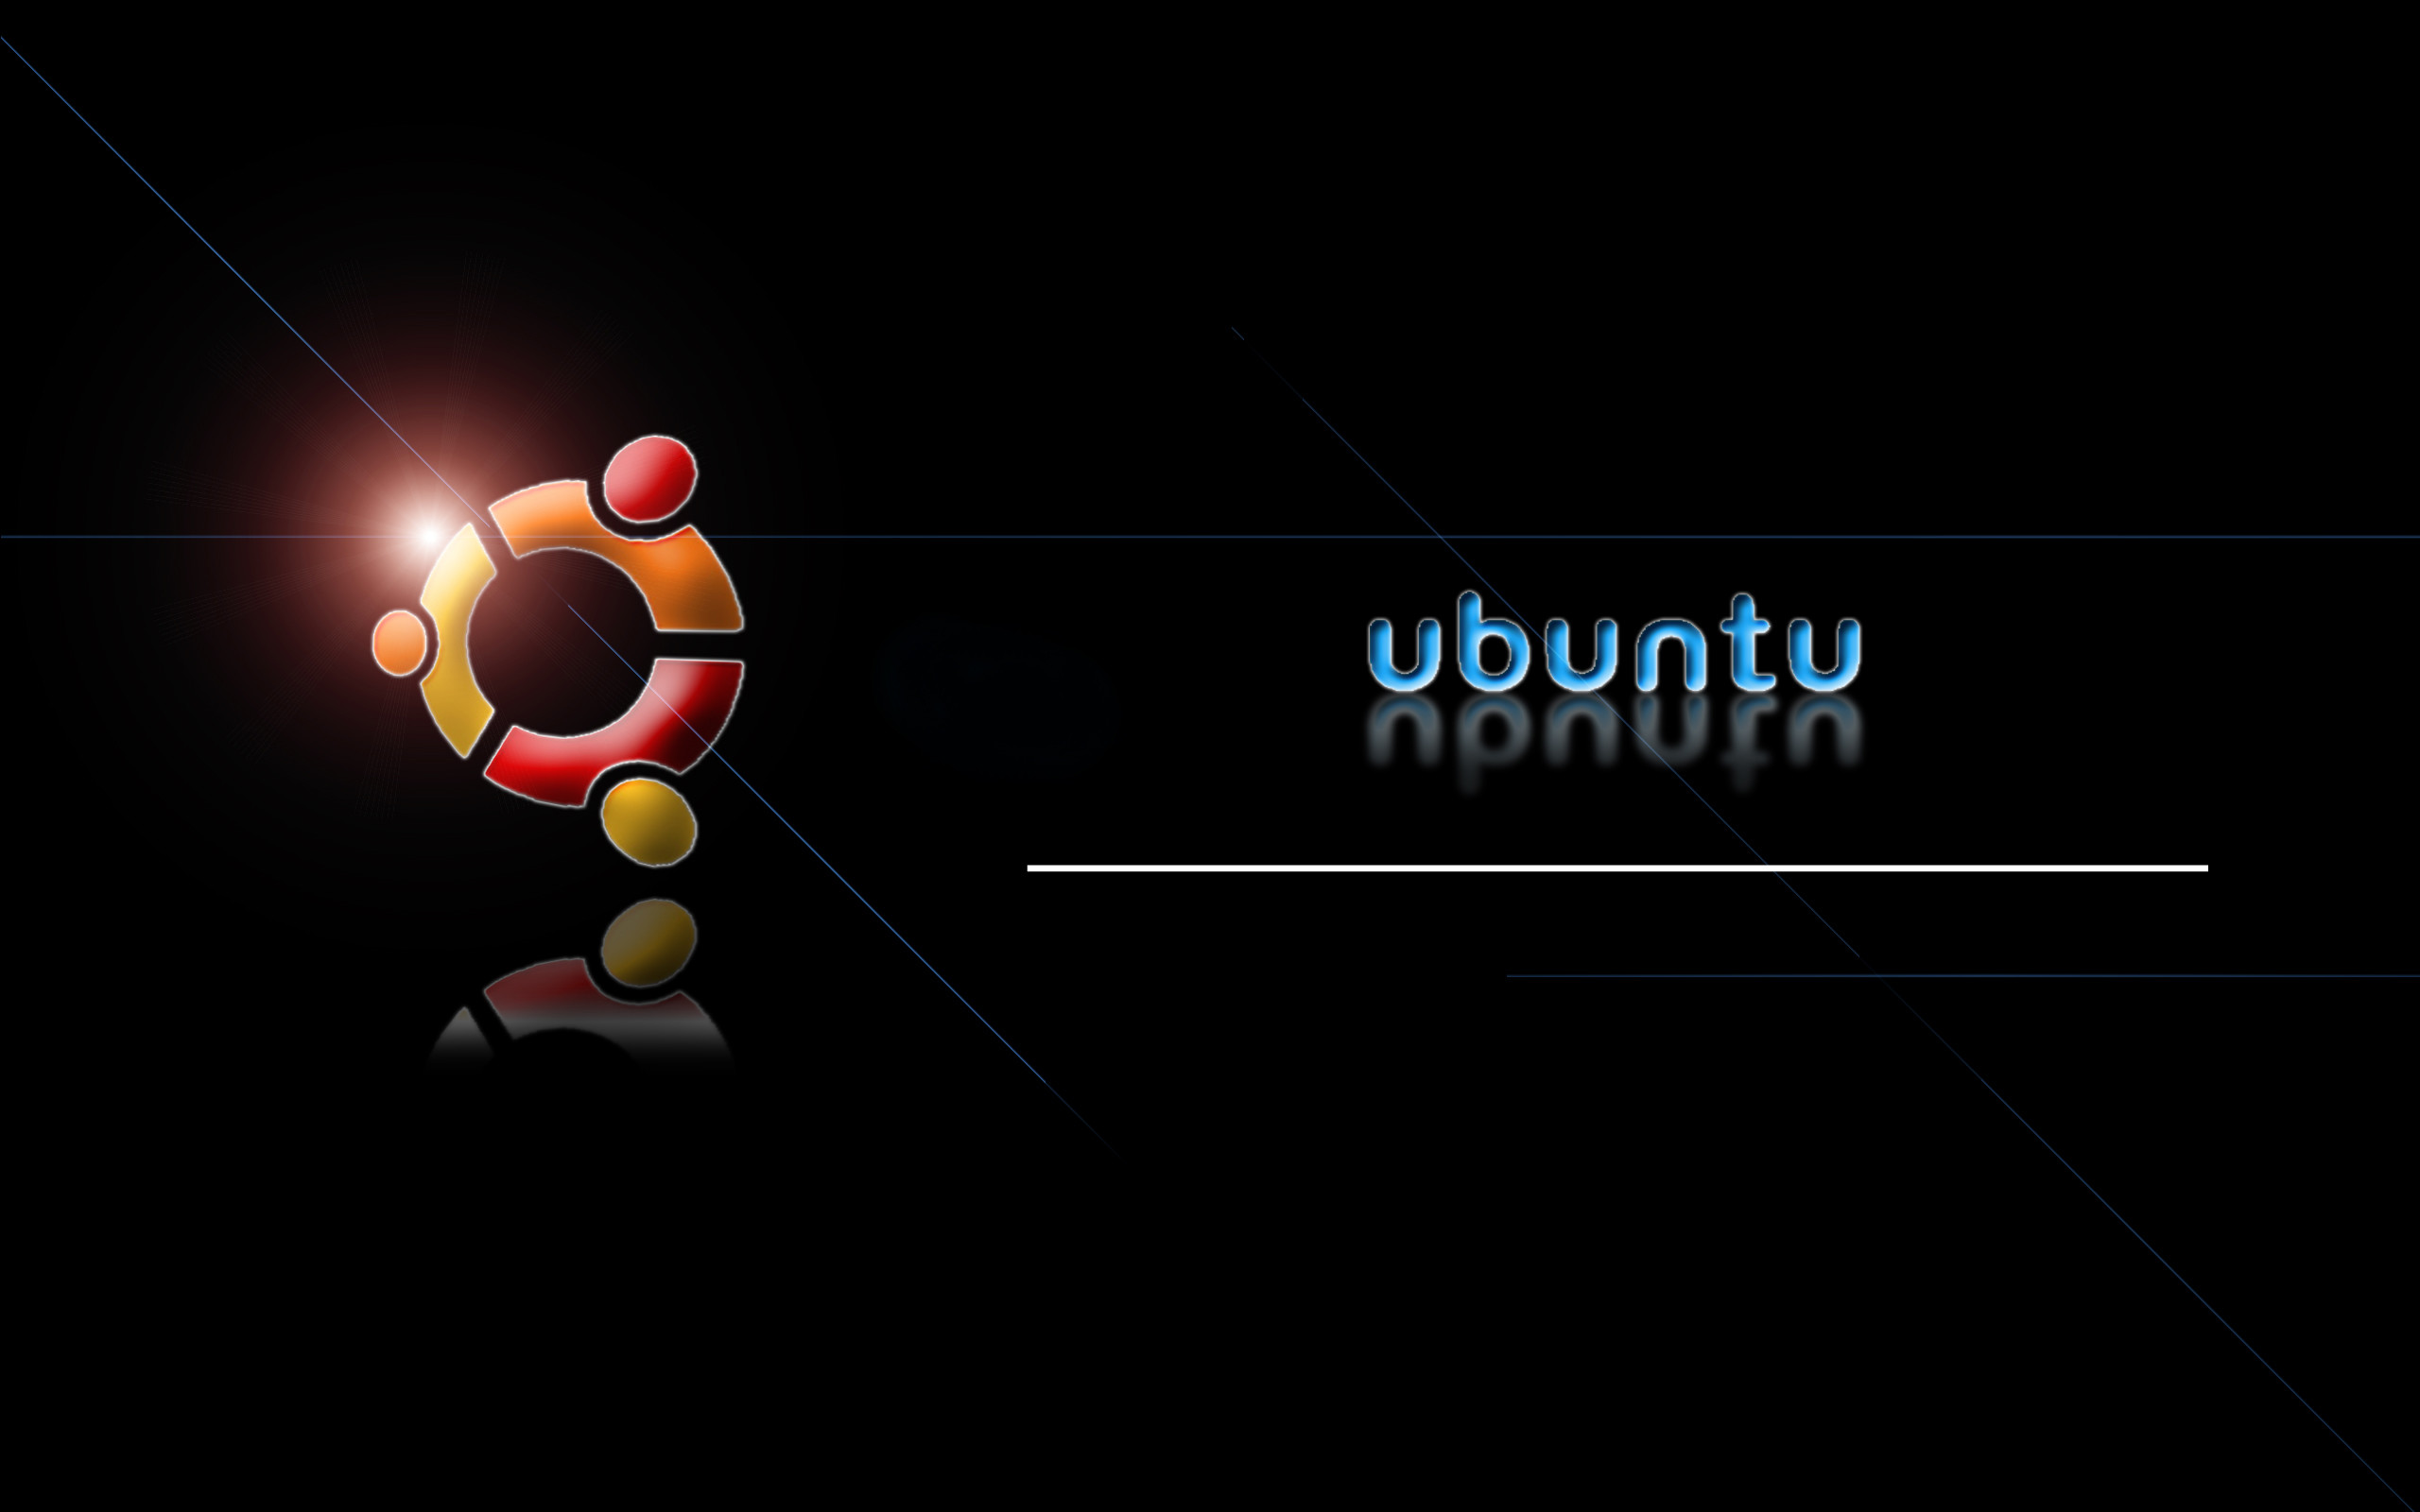 Linux Wallpapers Ubuntu Wallpaper, Desktop, HD, Free Download .